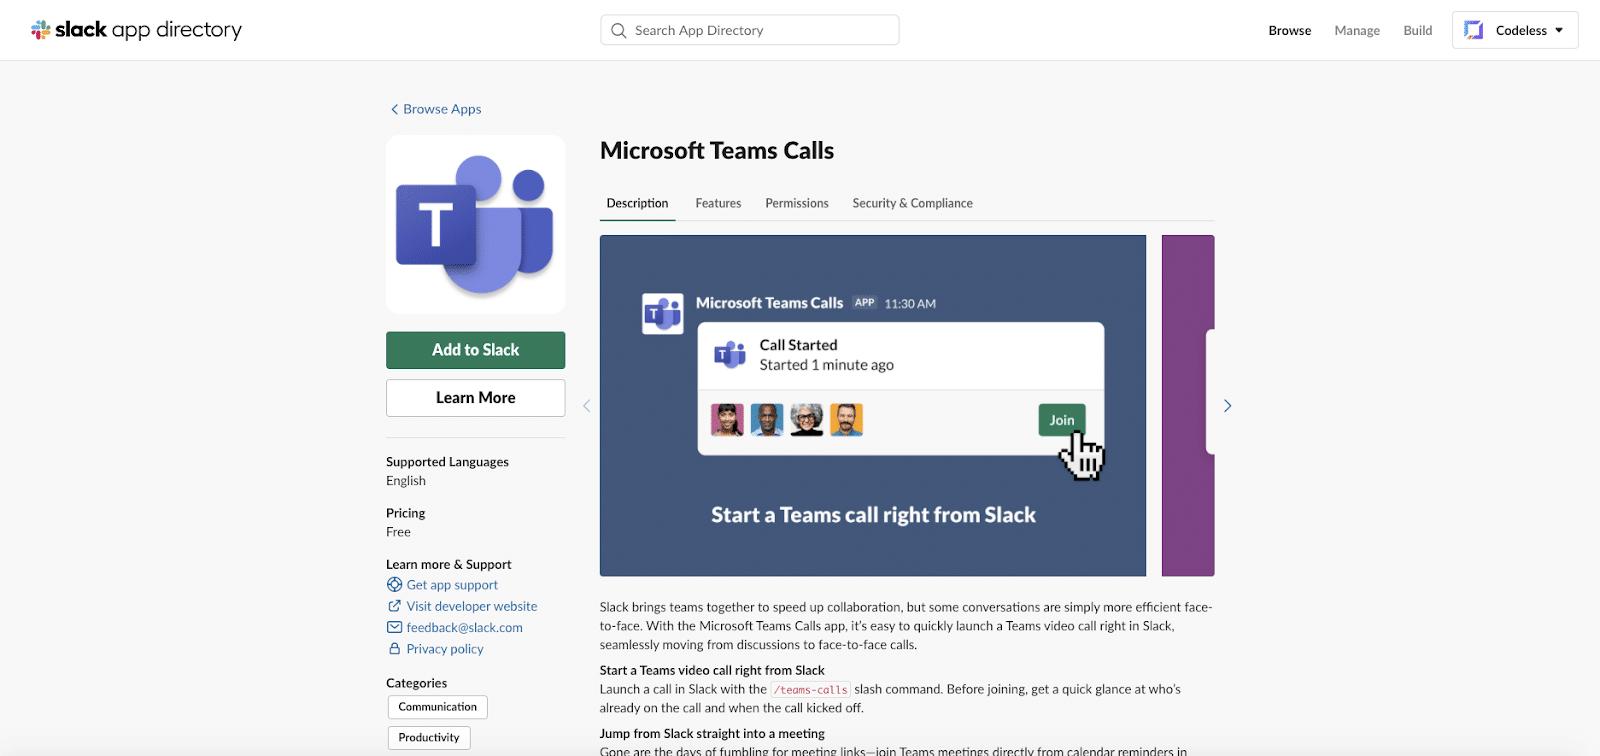 Microsoft Teams Calls app for Slack